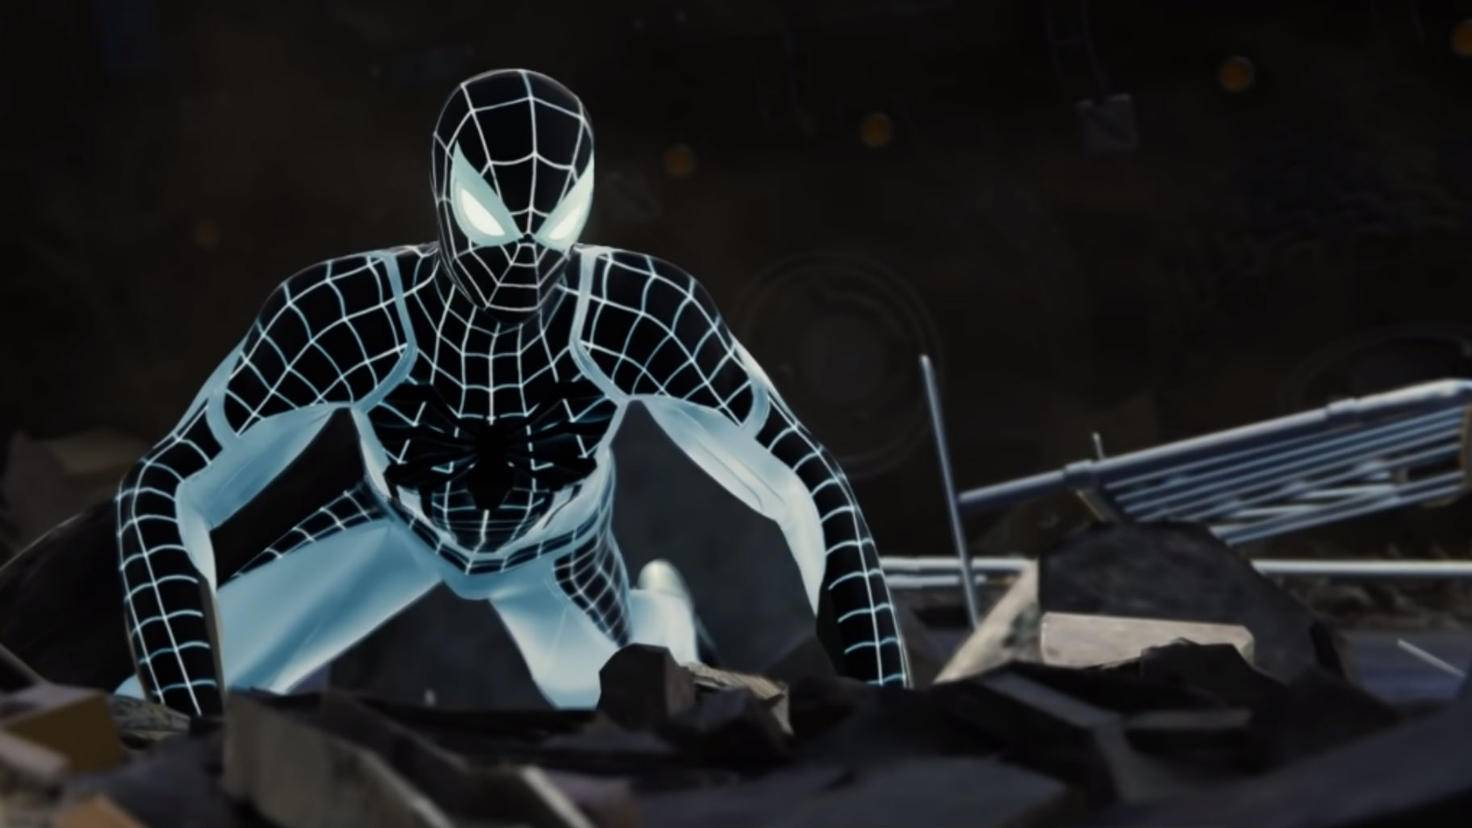 spider-man-ps4-negativ-anzug-screenshot